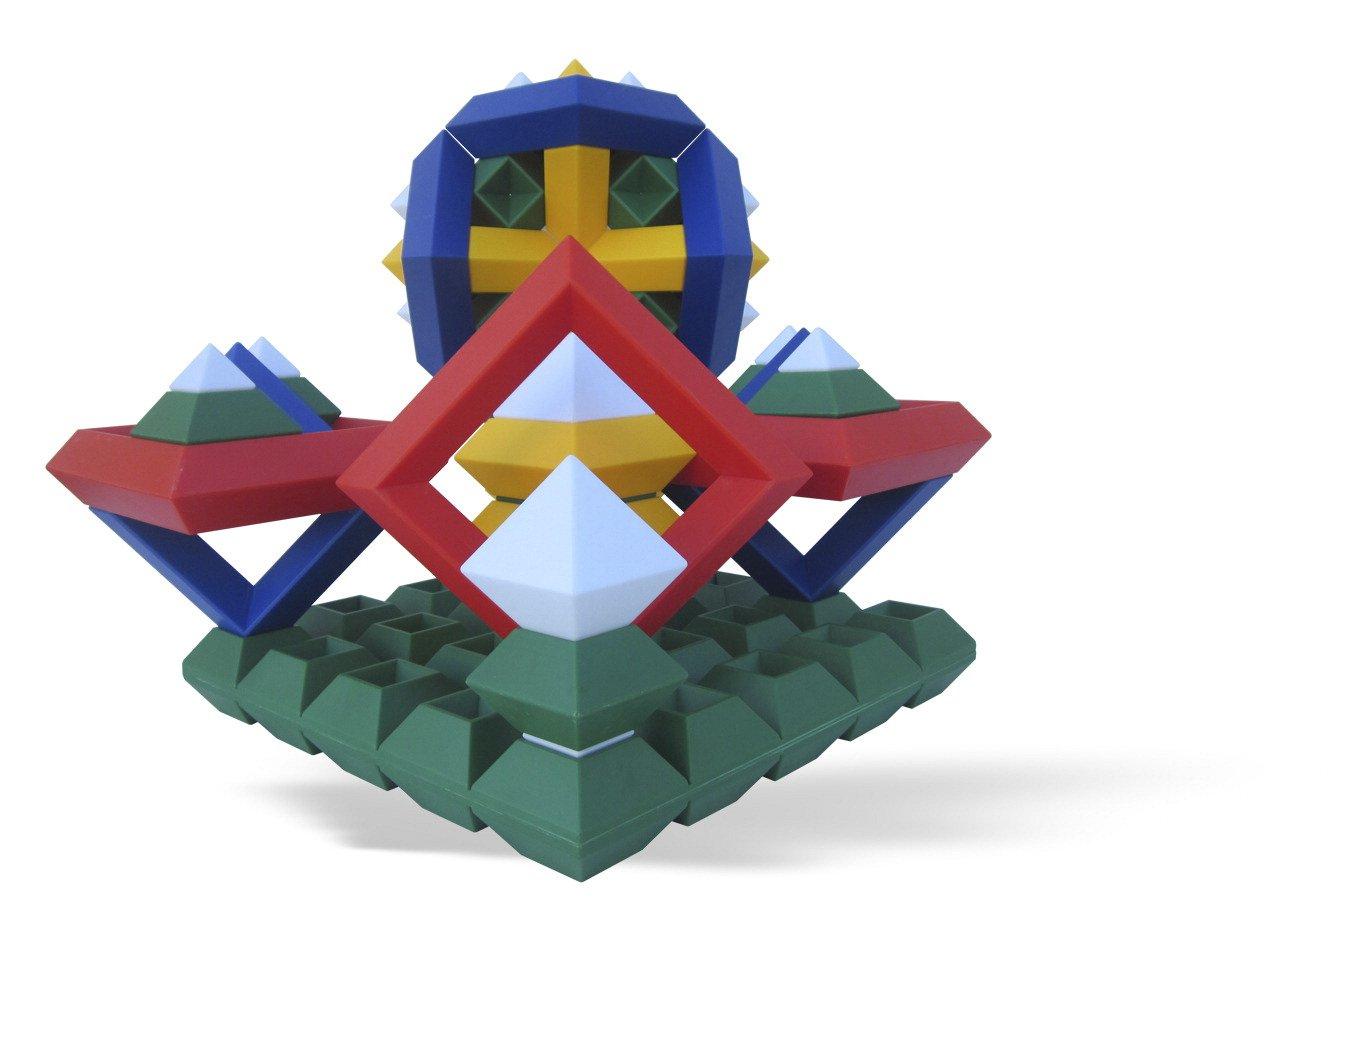 WEDGiTS 50 Piece Deluxe Imagination Set